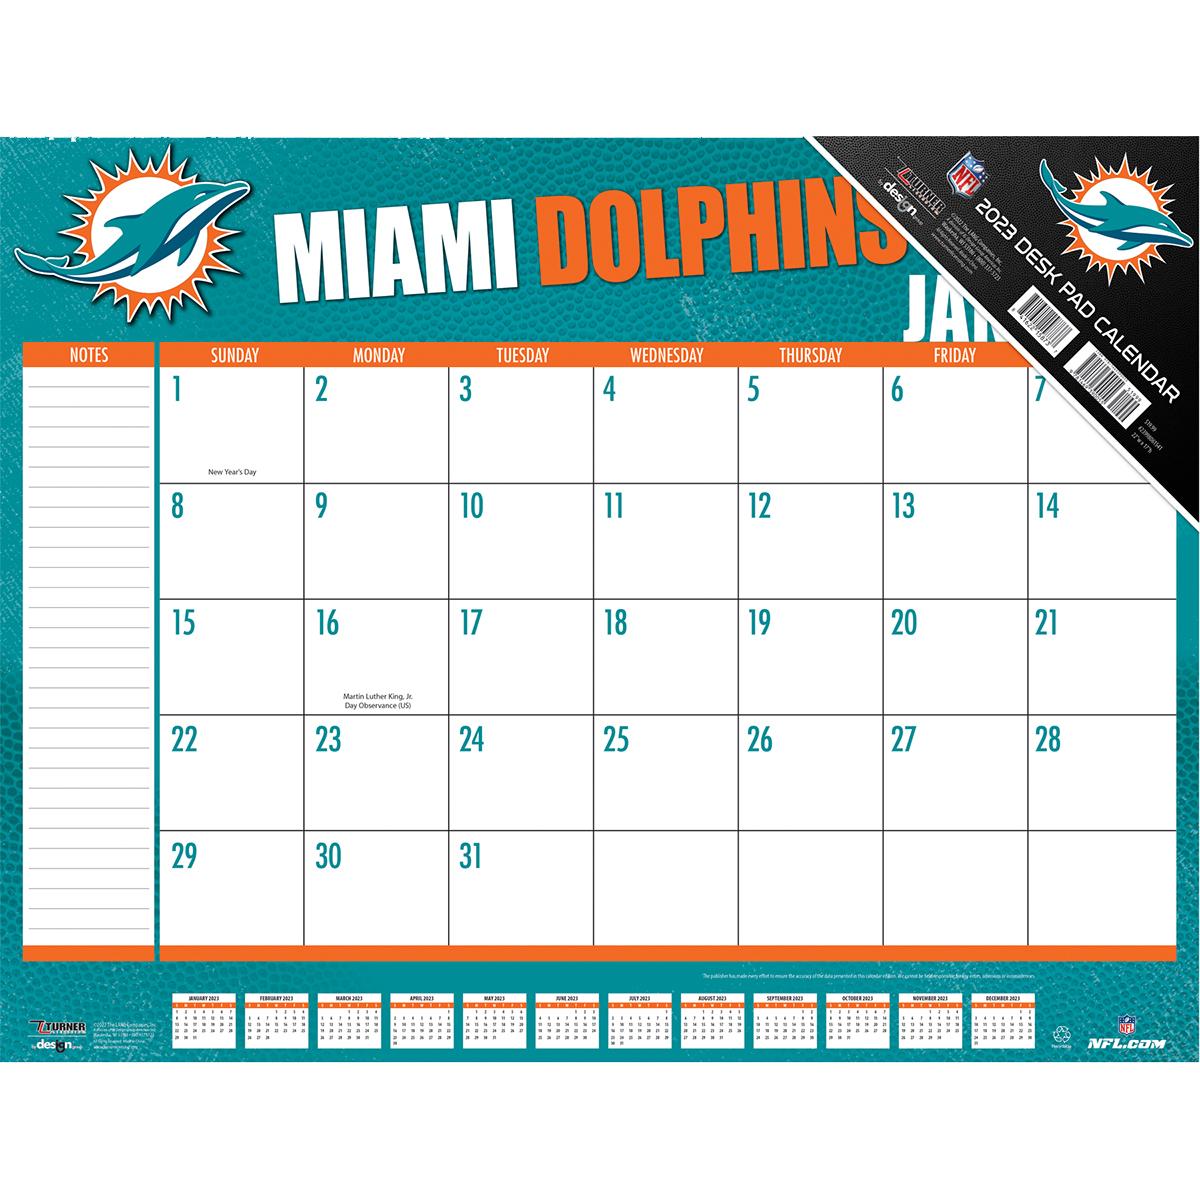 Miami Dolphins 2018 Nfl 22 X 17 Desk Calendar Buy At Khc